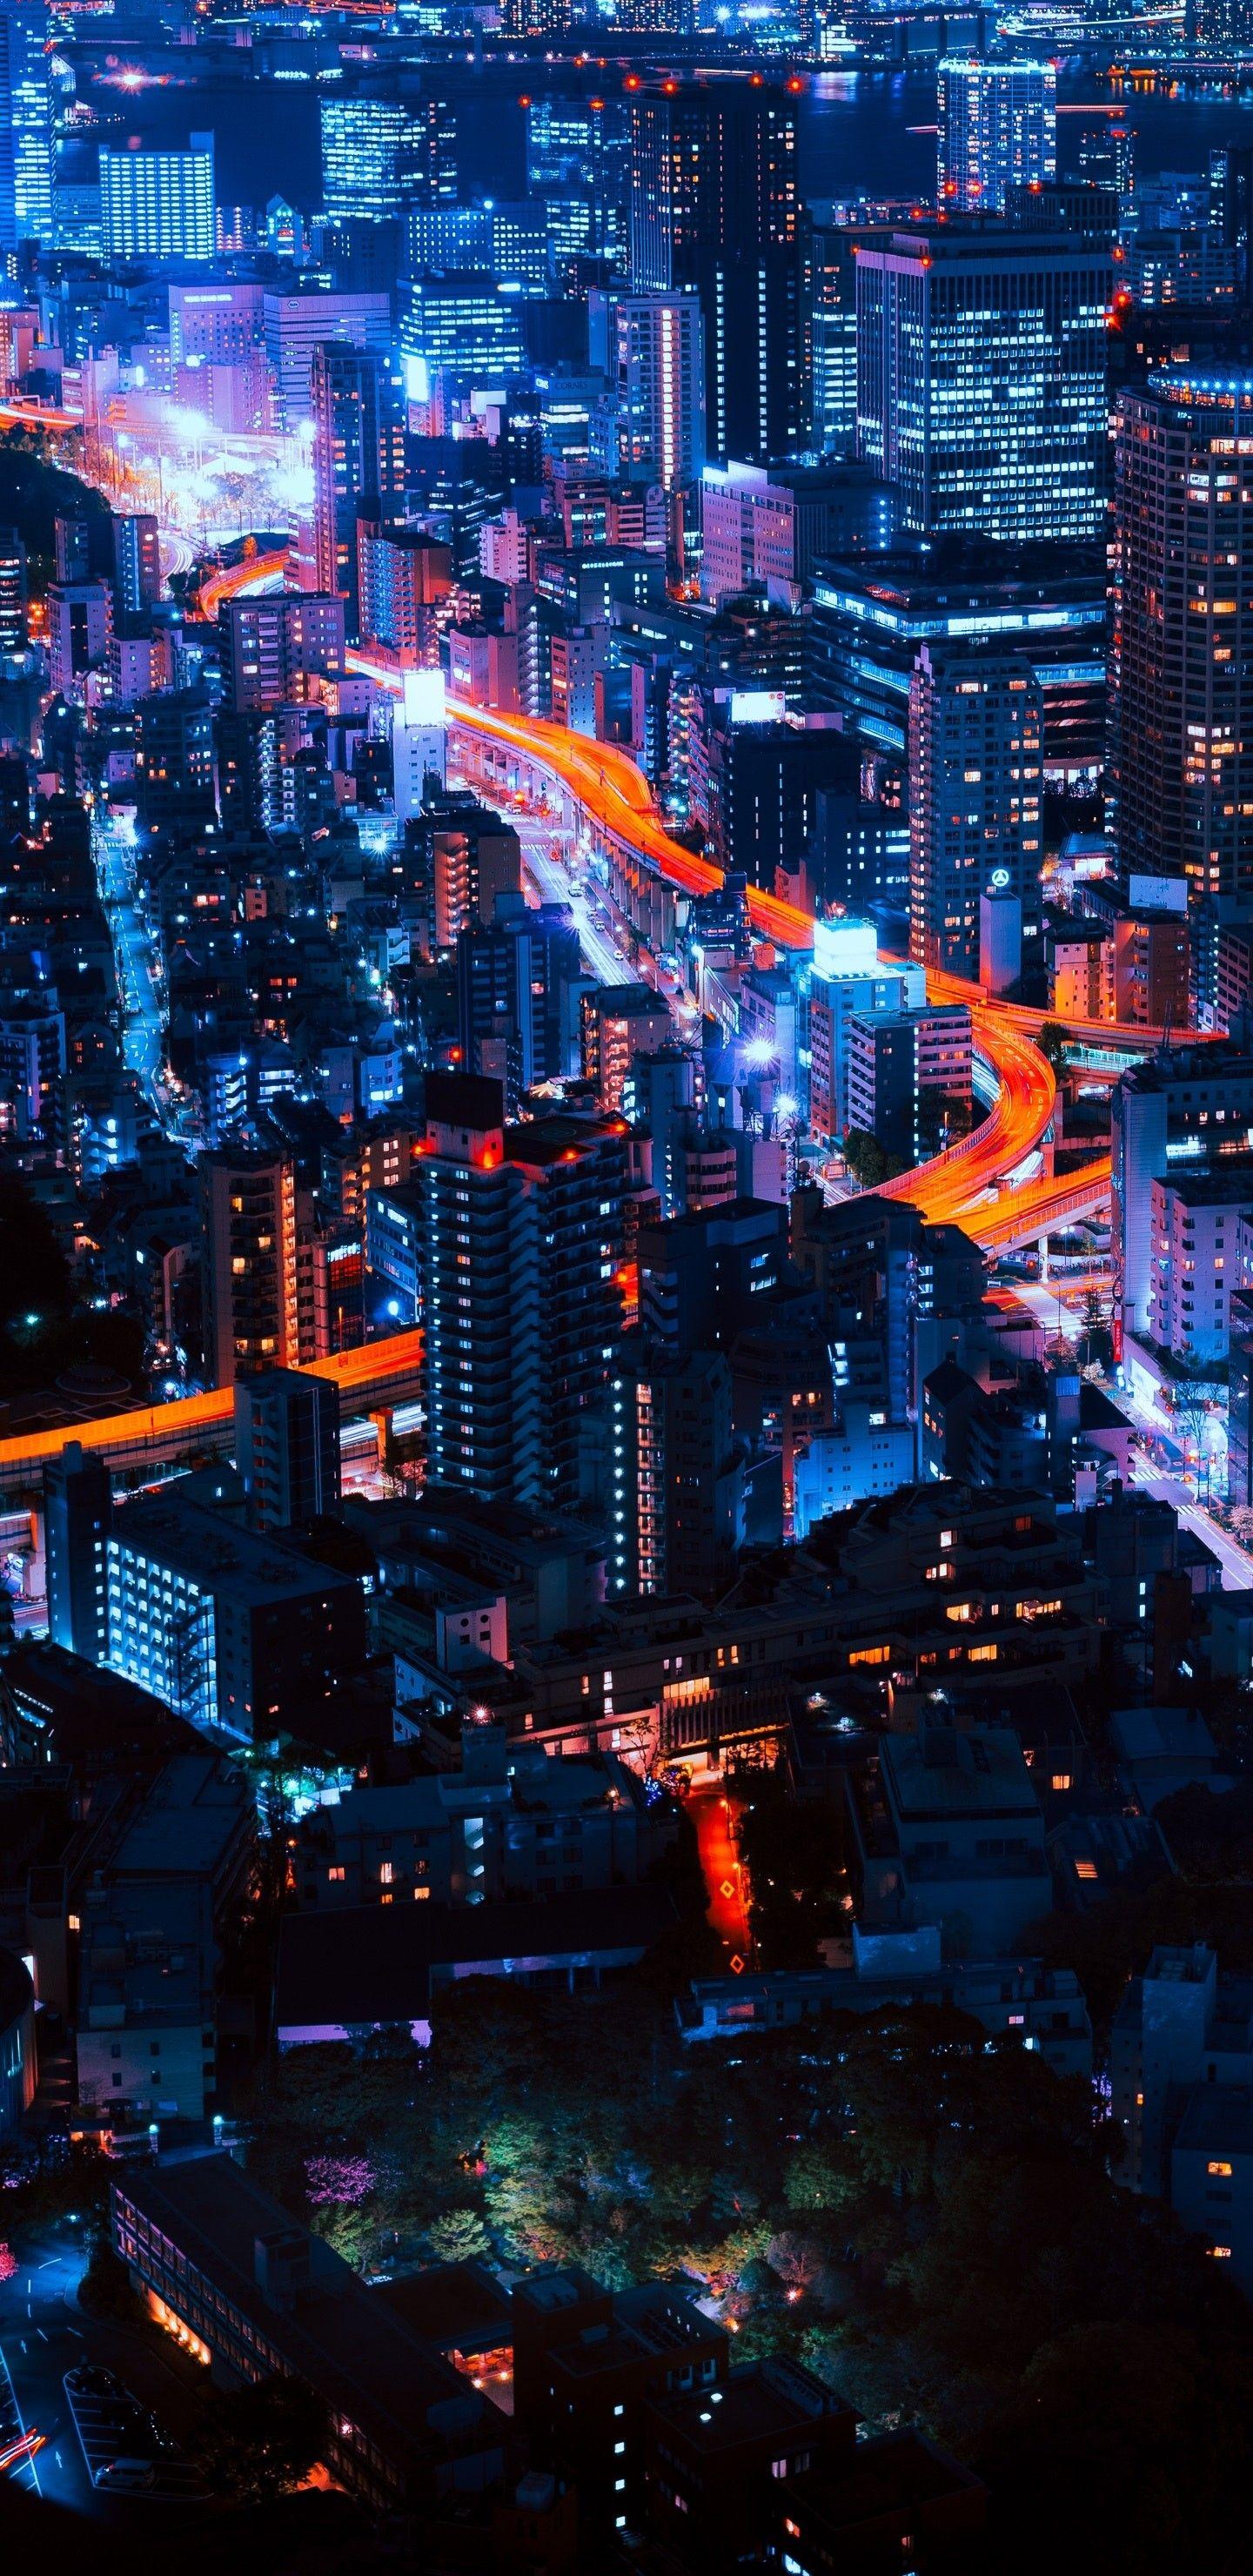 1440x2960 Hd Wallpaper 049 City Iphone Wallpaper City Wallpaper Neon Wallpaper